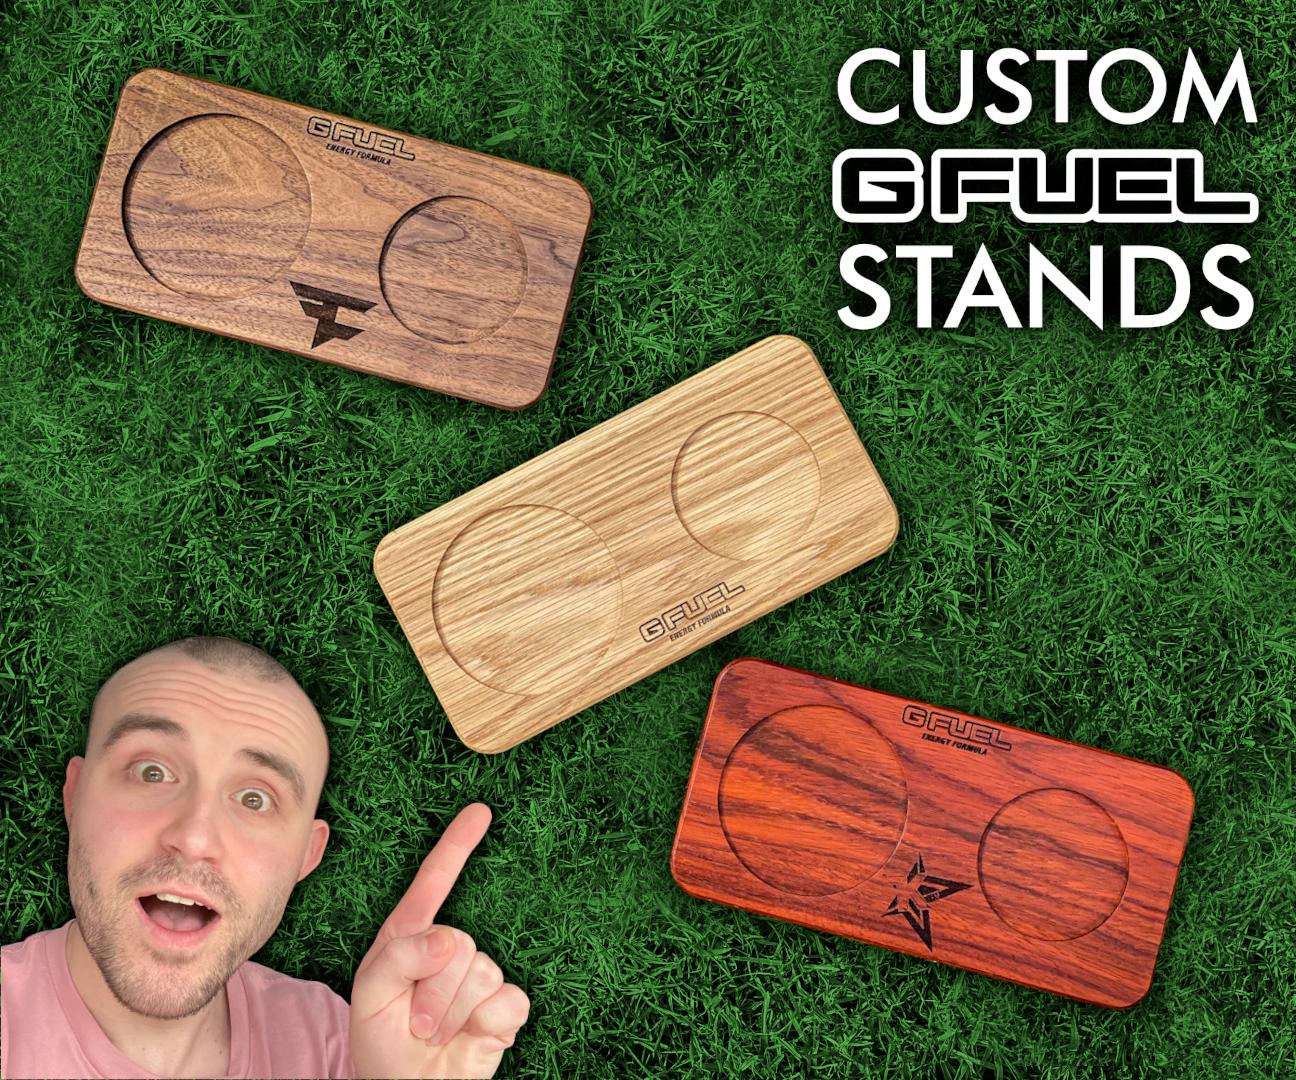 Making Custom GFuel Stands - Craft Fair Idea